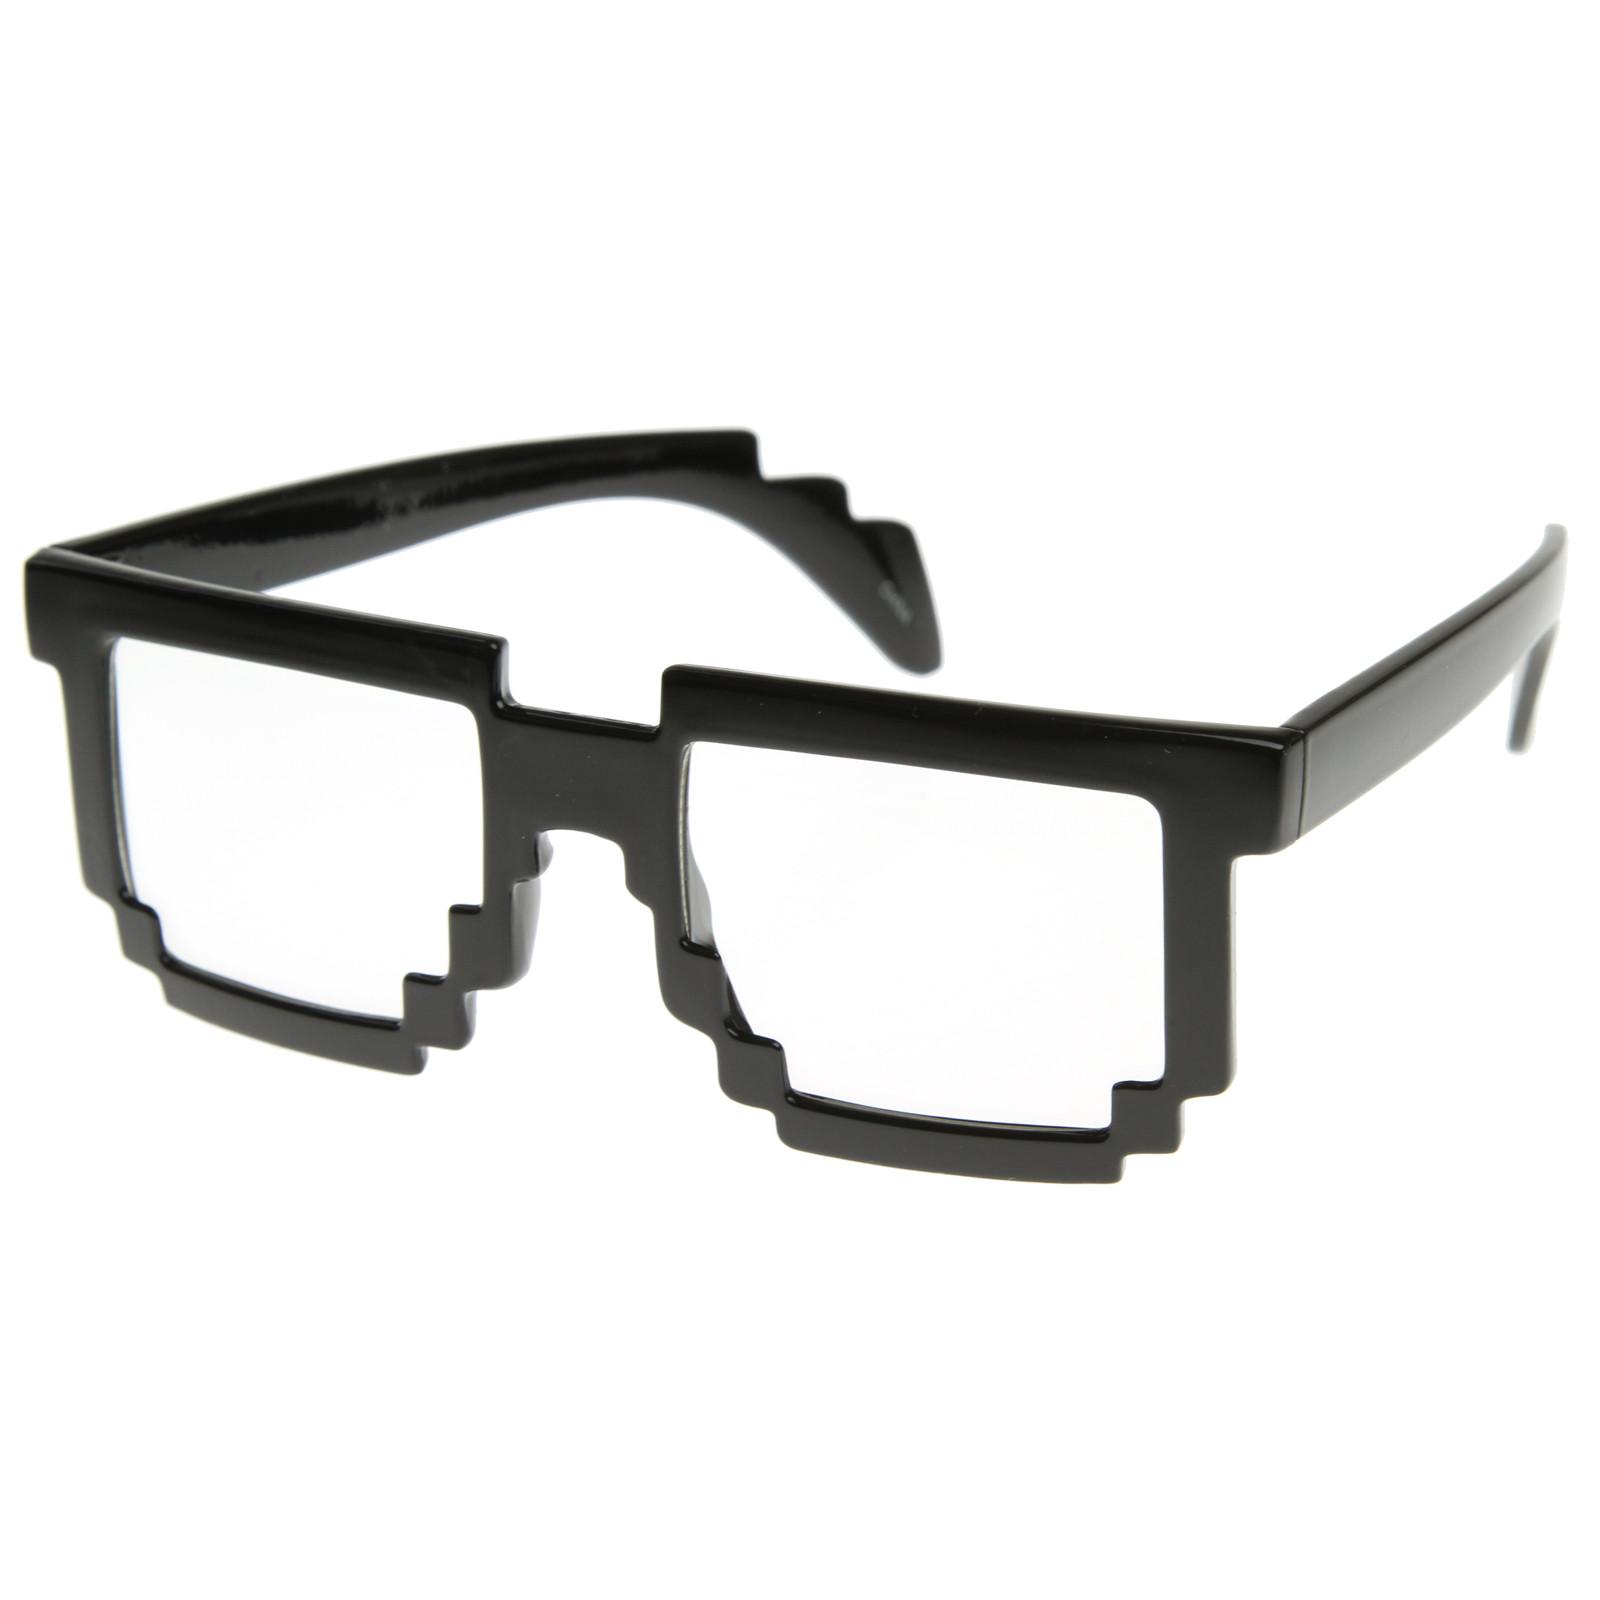 Spectacles clipart cool glass Clipart transpar glasses